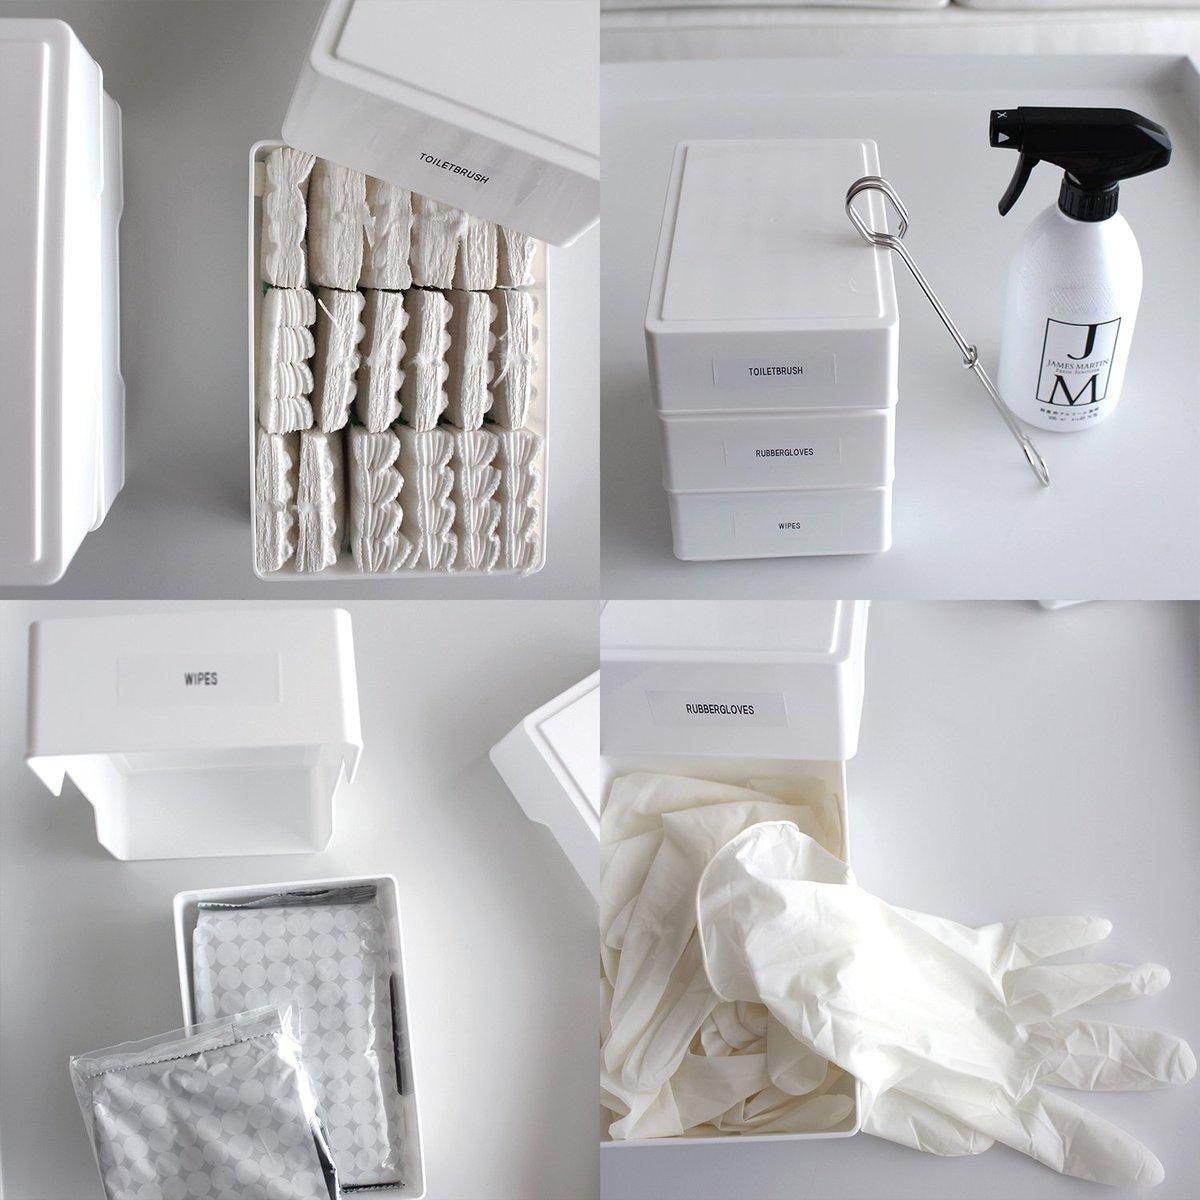 test ツイッターメディア - トイレのお掃除記事の続きです?  セリアの新商品!  シンプルで白いストレージケースにシンデレラフィットする お掃除アイテムとトイレ掃除の流れ  https://t.co/gSvCFmeBMh  #セリア #100円ショップ #100均 #収納ケース #収納 https://t.co/HwGXcIWU5H